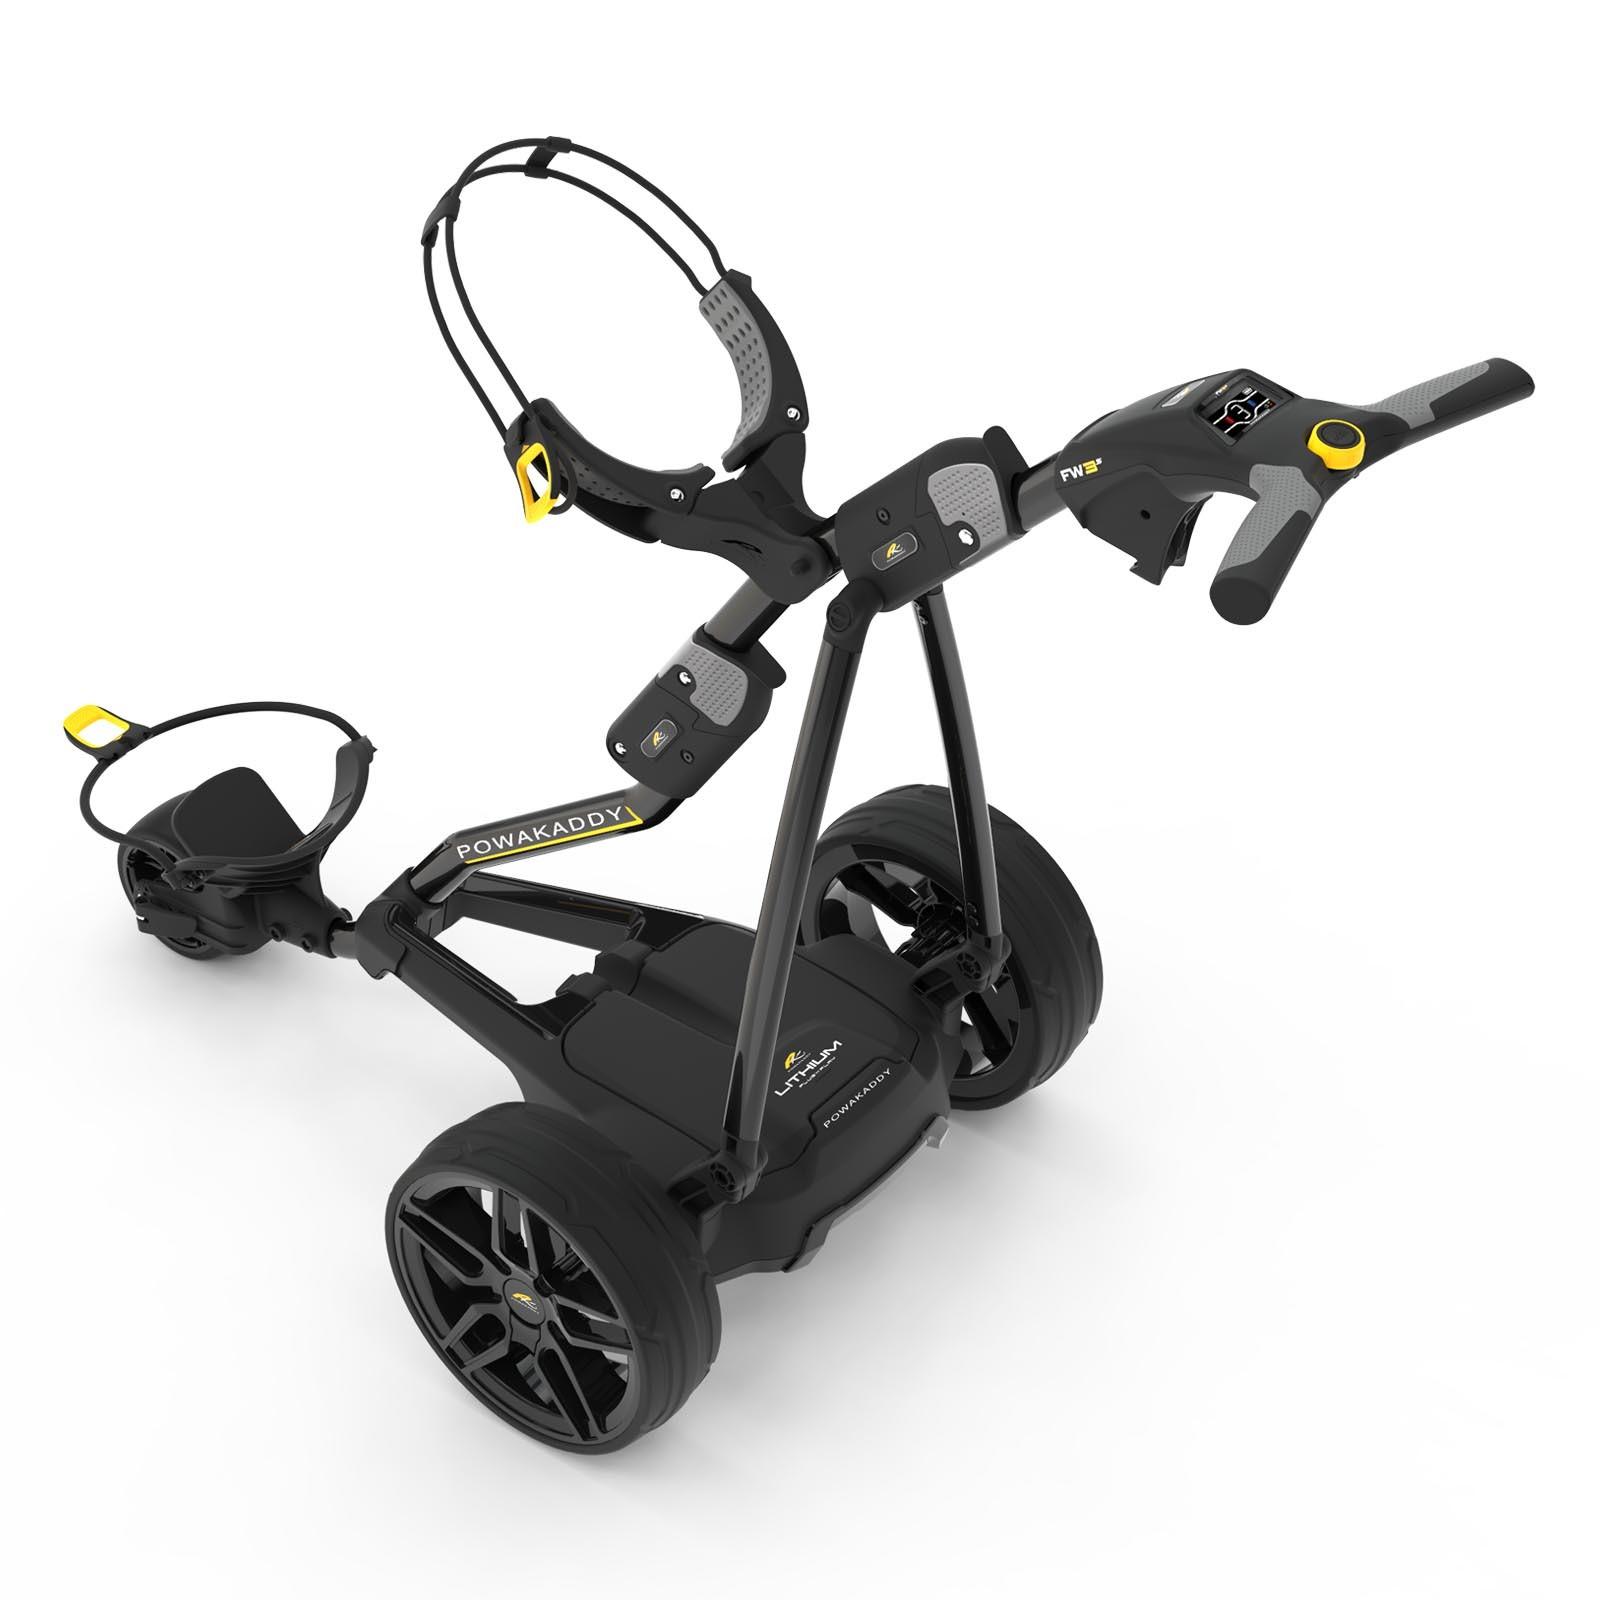 Powakaddy FW3s Golf Trolley (18 Hole Lithium Battery)